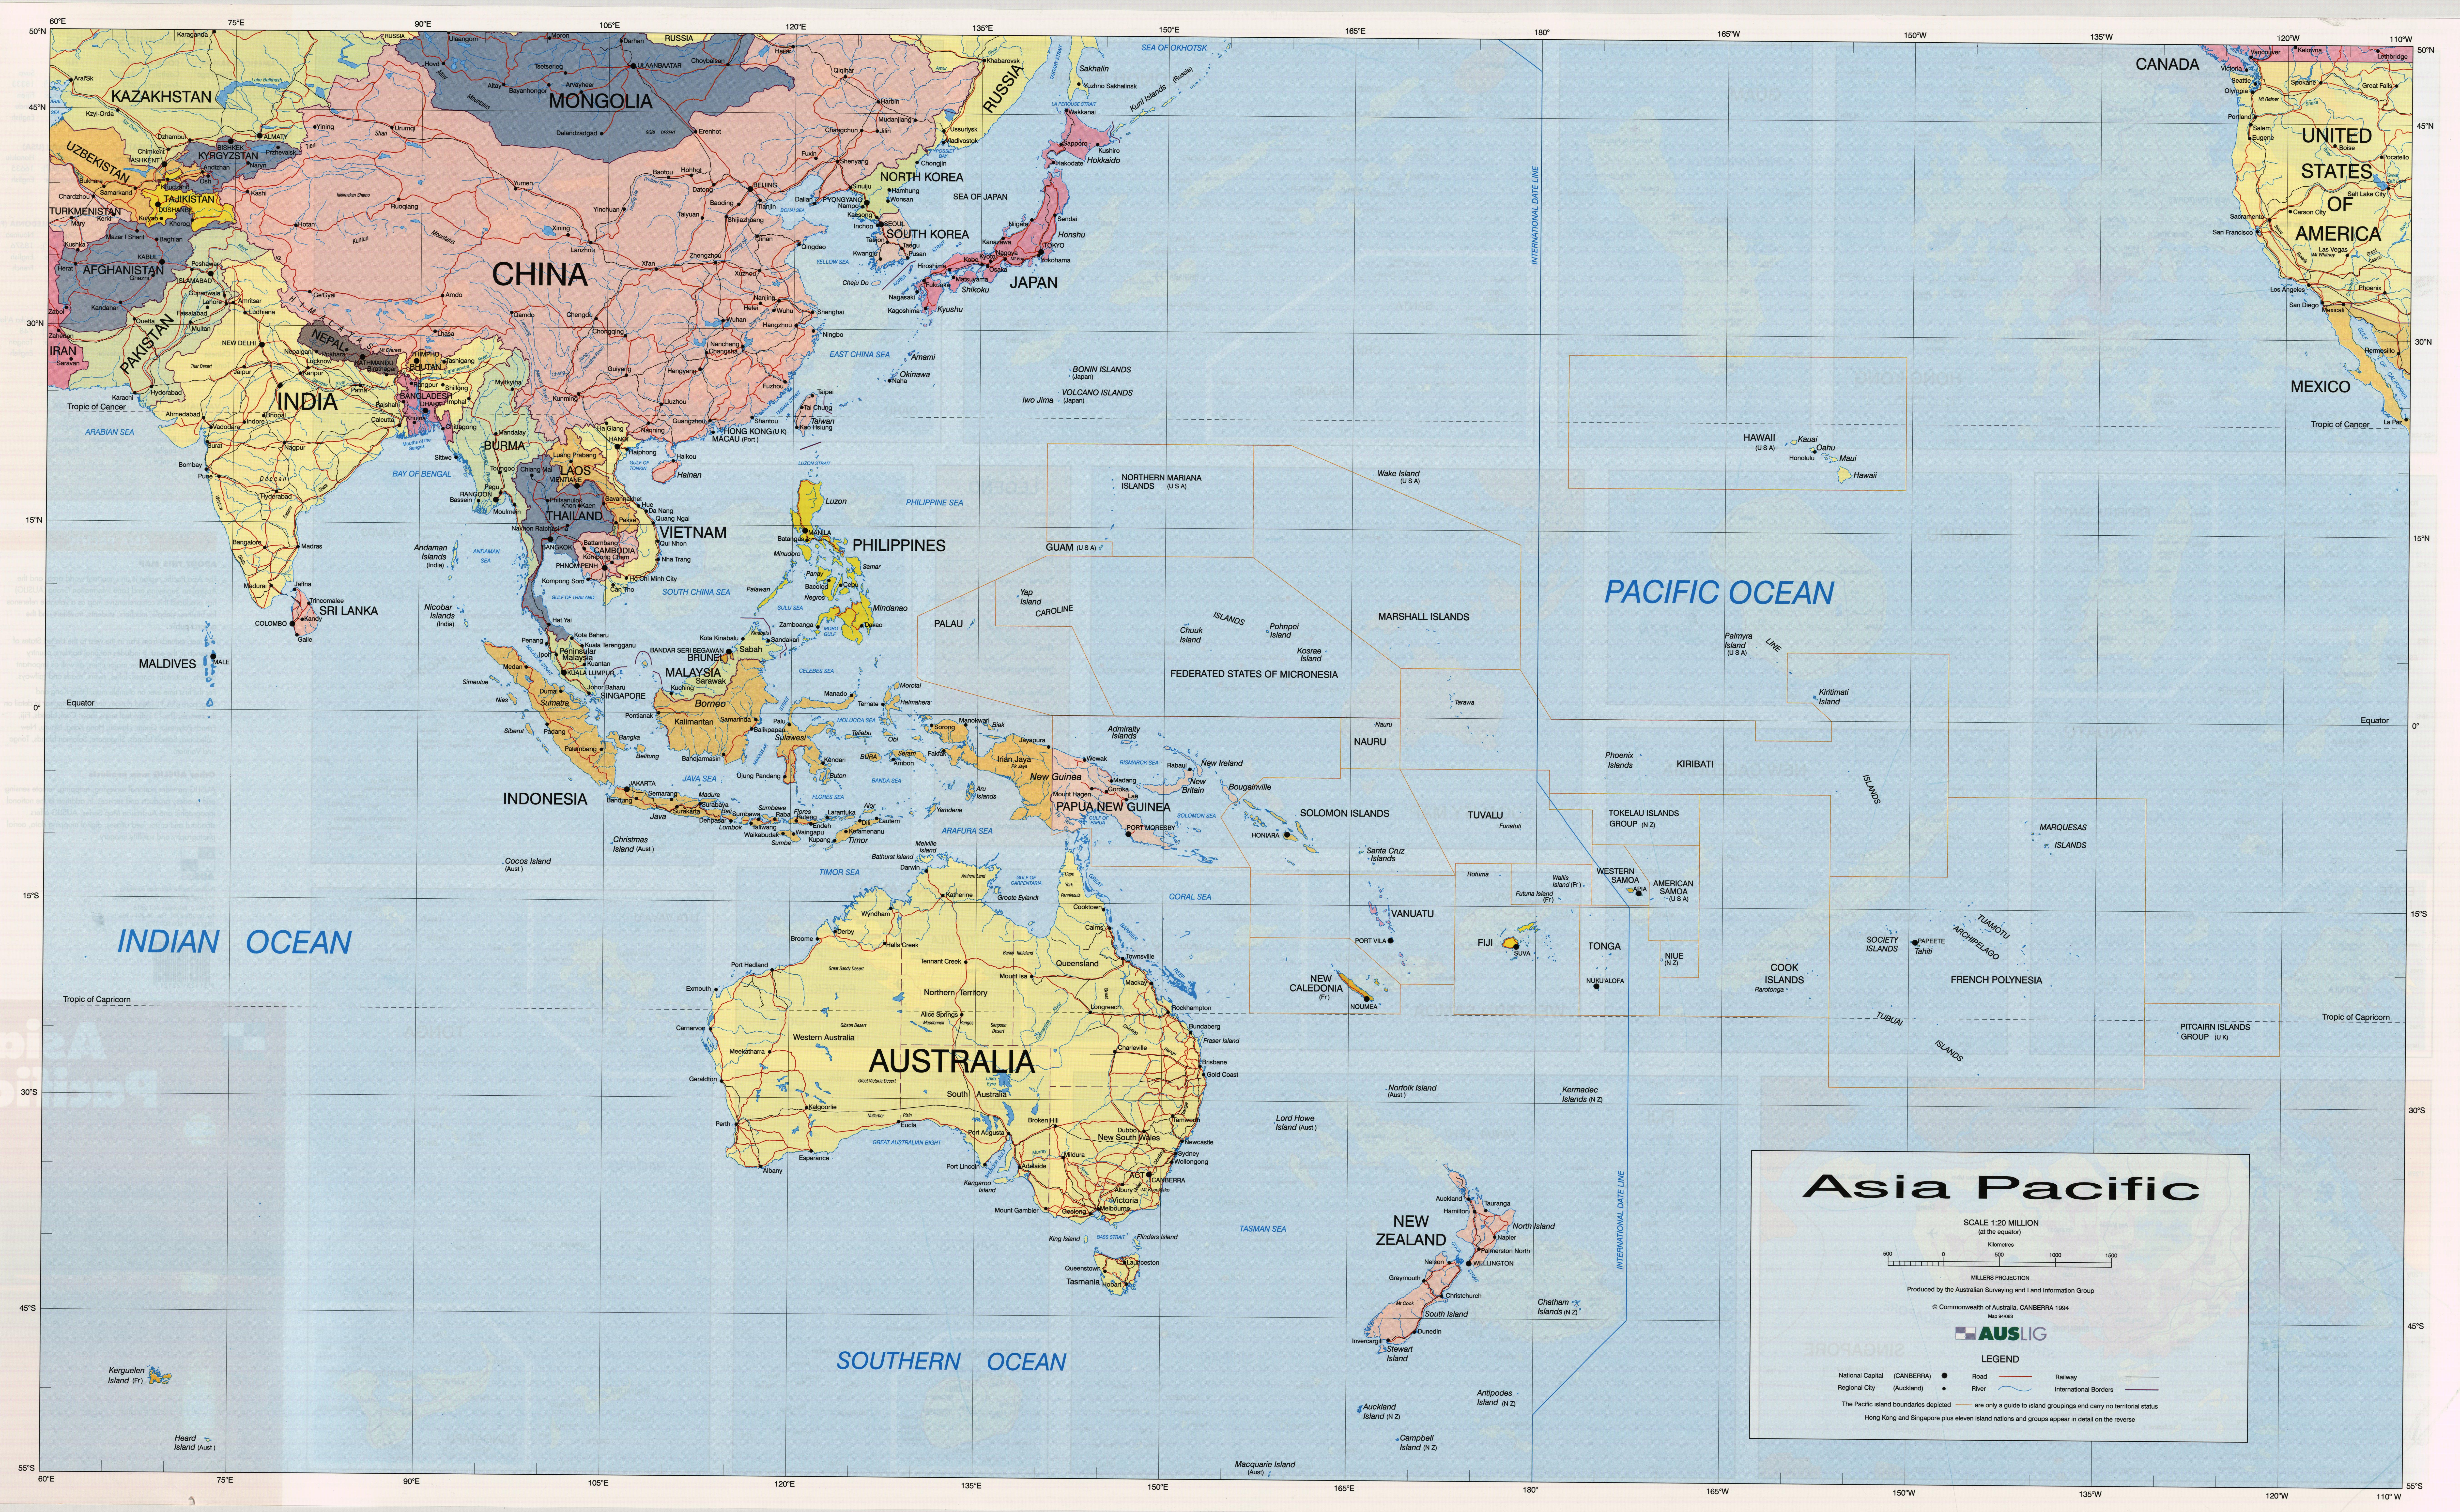 Geoscience Australia Metadata for Asia Pacific Map